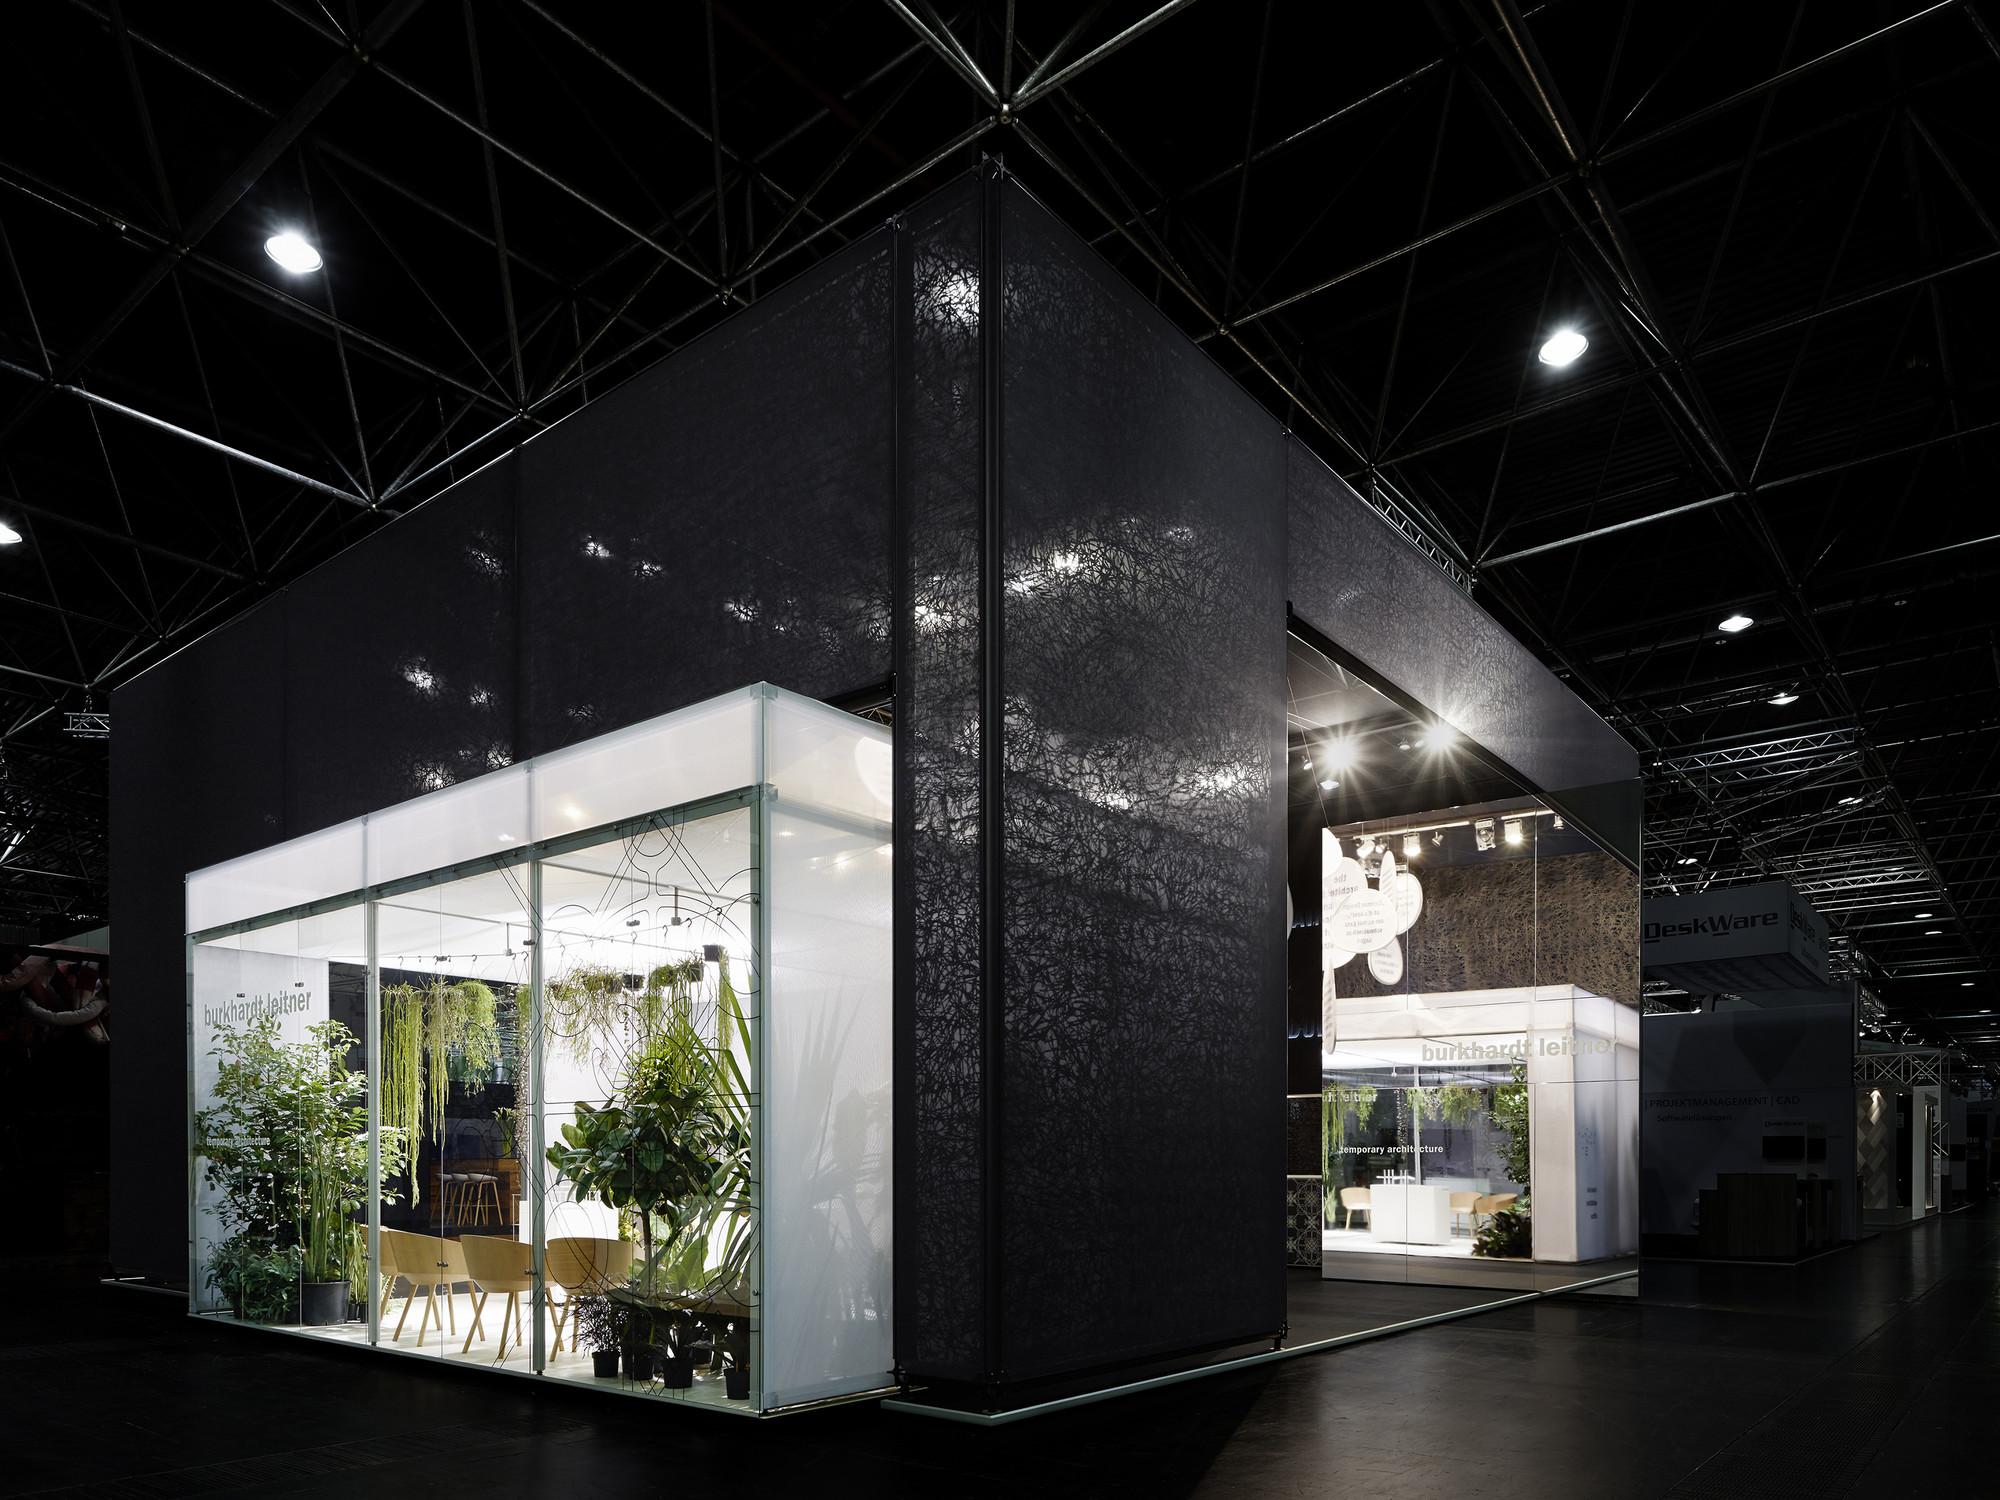 Exhibition Stand Ceiling : Burkhardt leitner constructiv exhibition ippolito fleitz